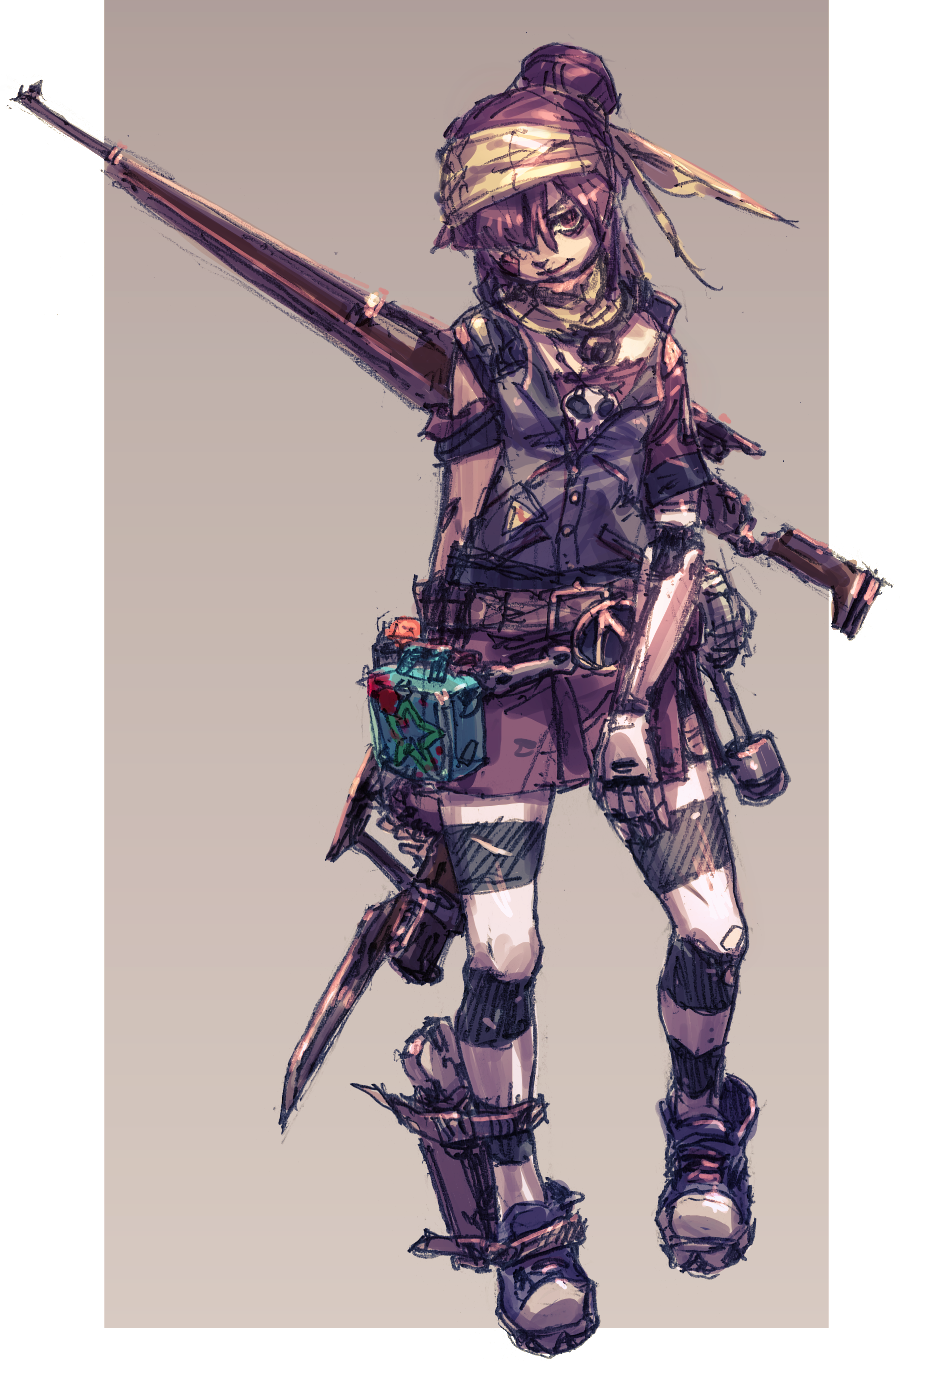 jikan hakushaku,artist,Borderlands 2,Borderlands,Игры,Gaige,Гейдж,BL